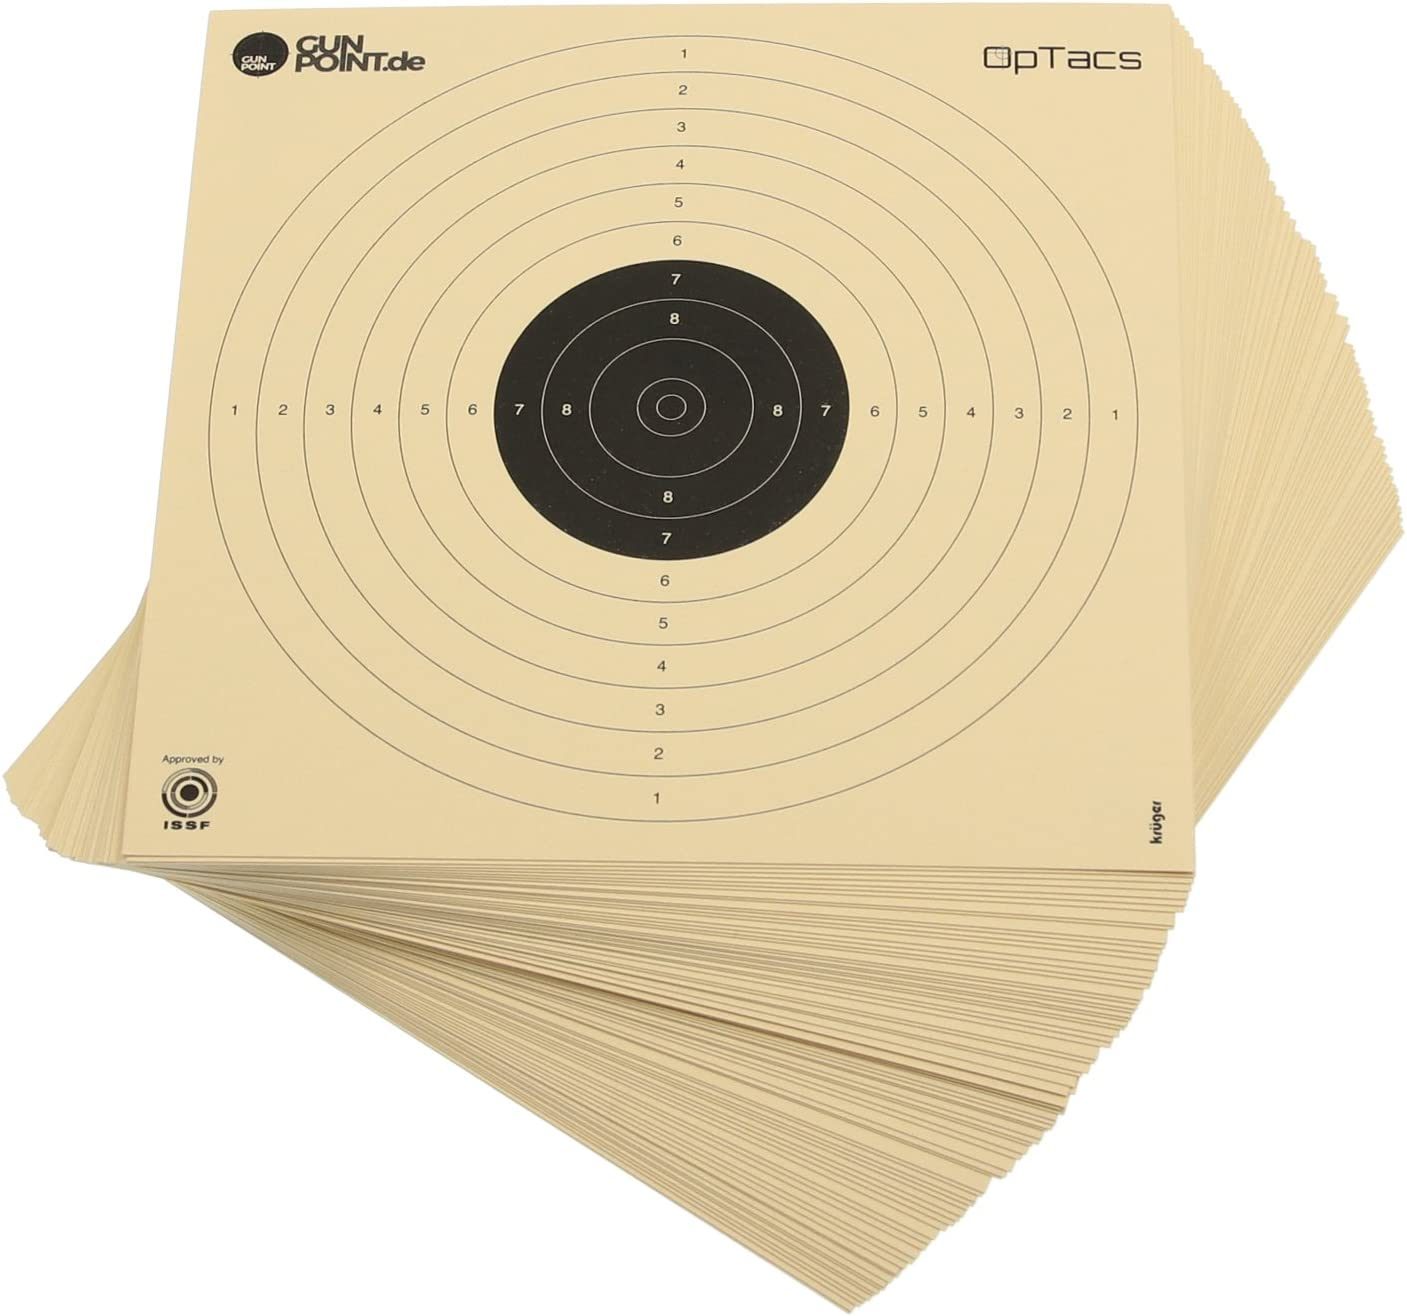 250 unidades de disco de pistola de aire 17 x 17 cm / diana de pistola de aire